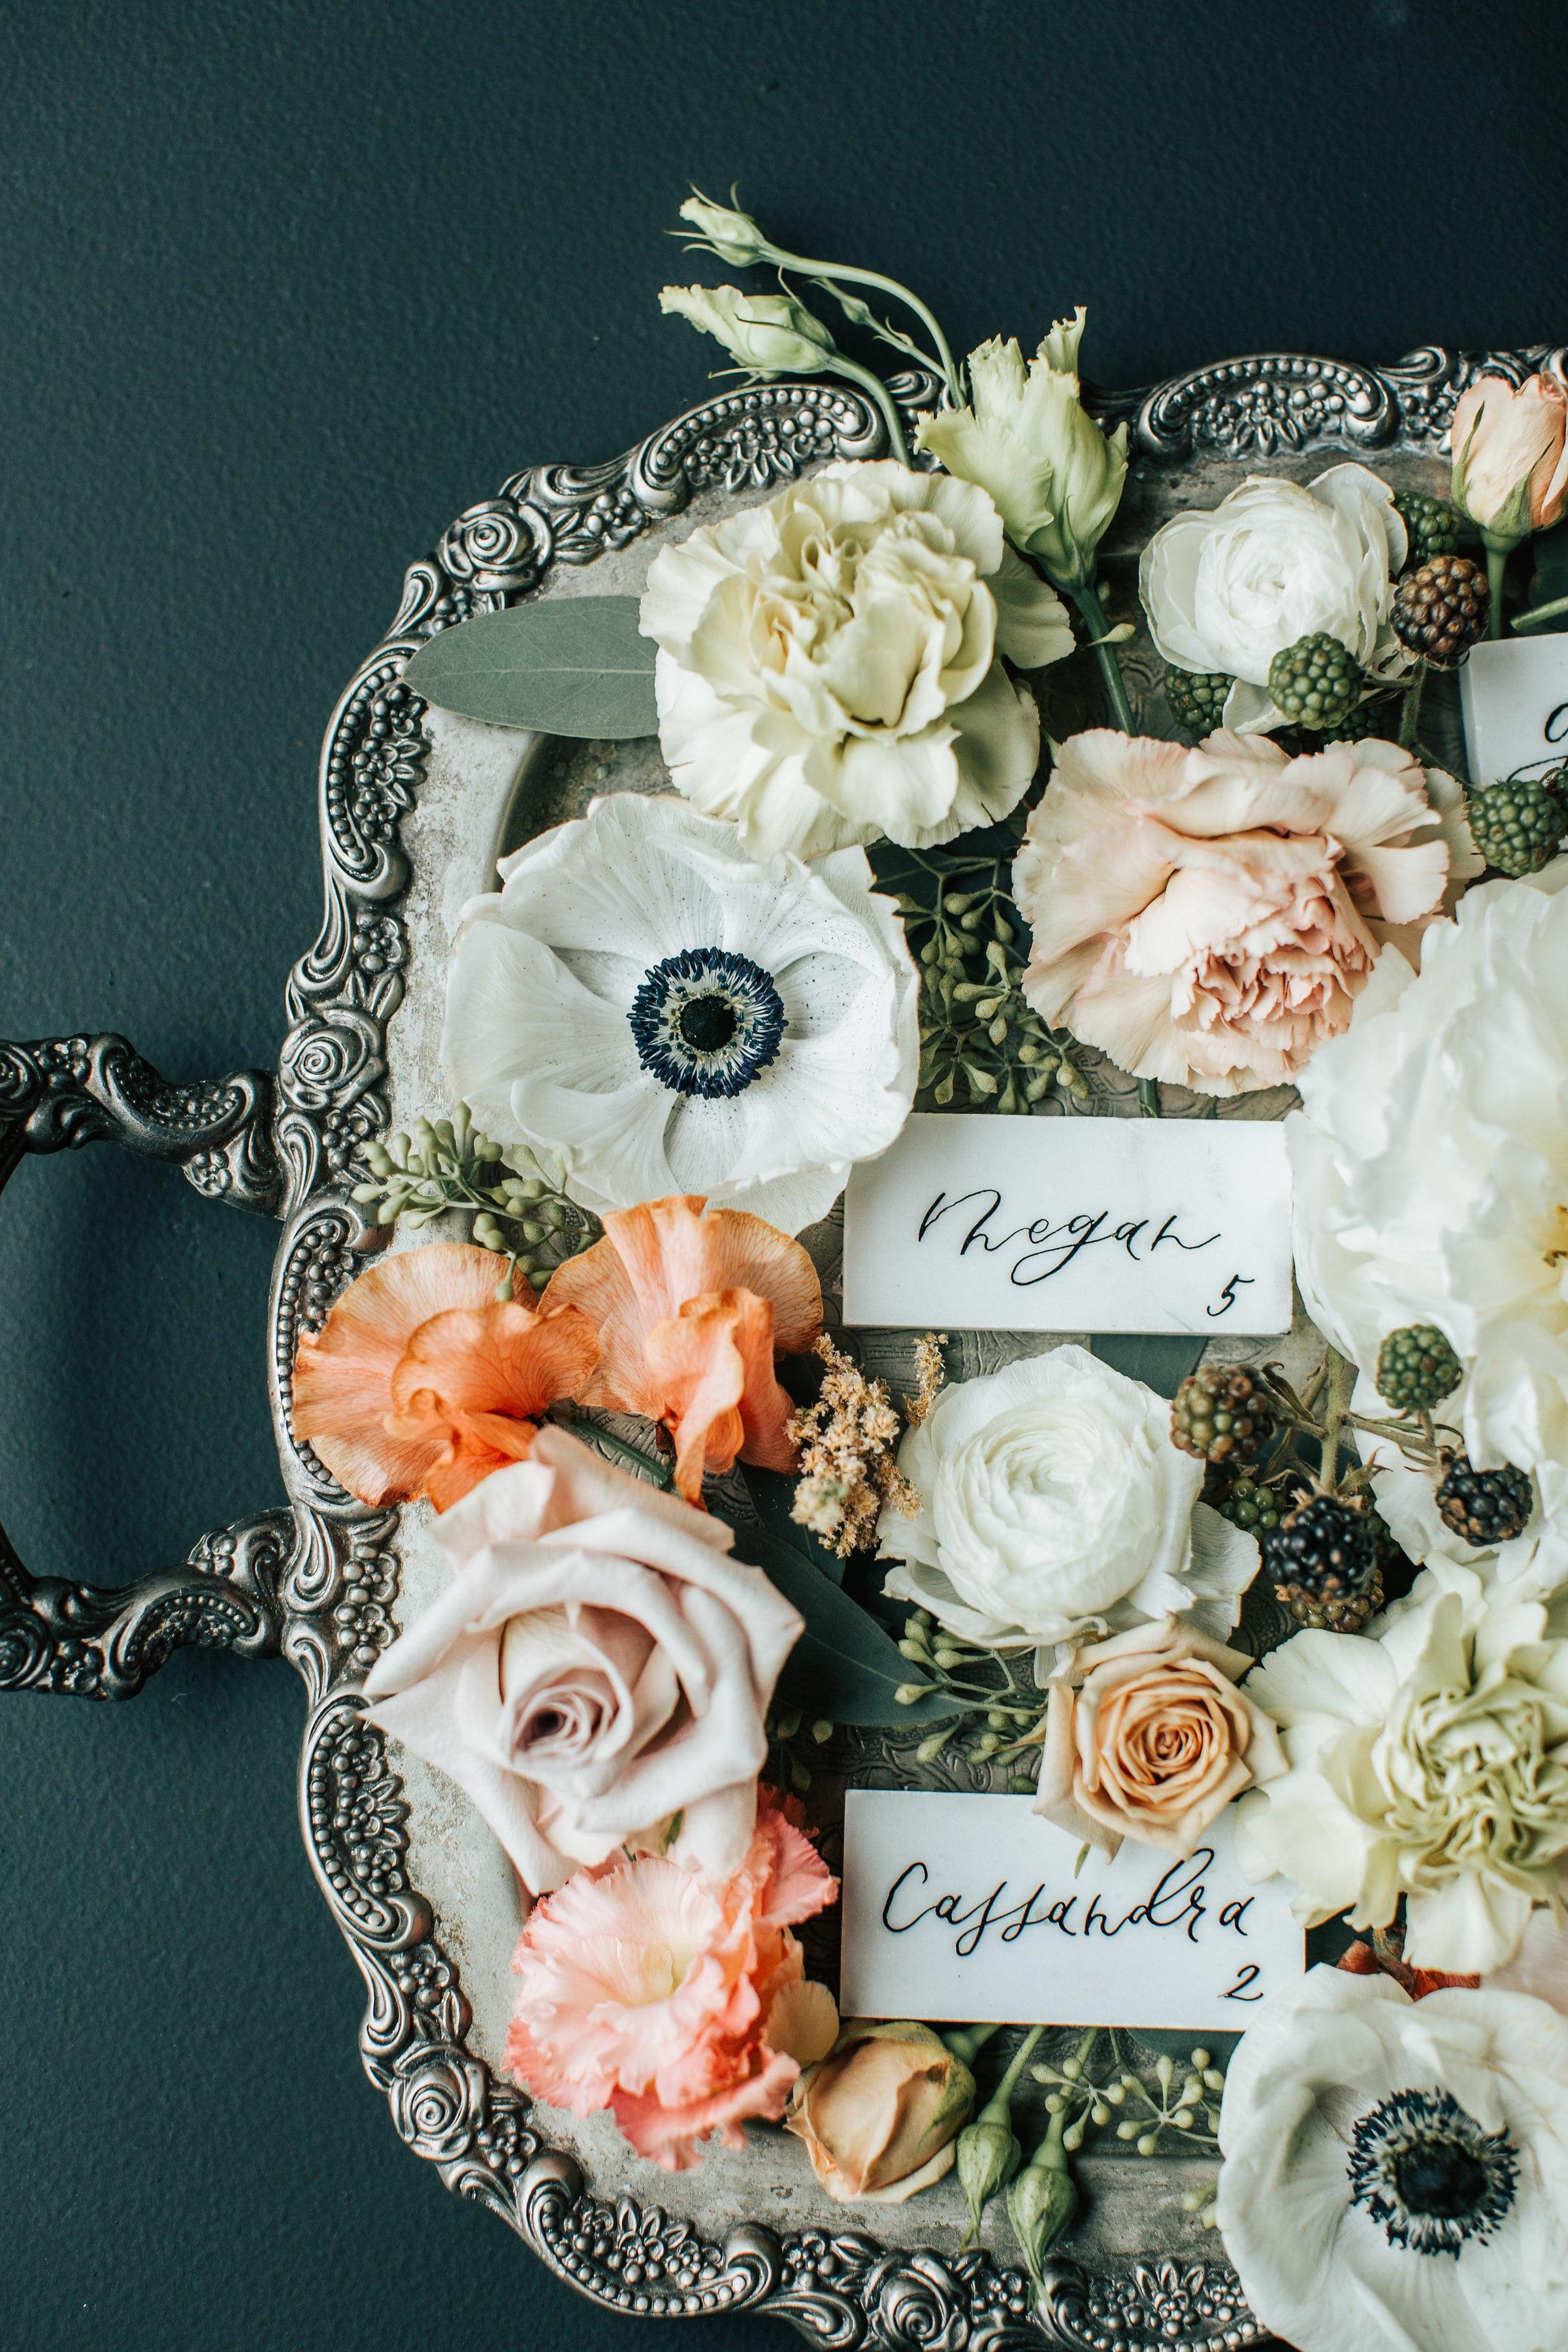 magnolia-wedding-277-min.jpg